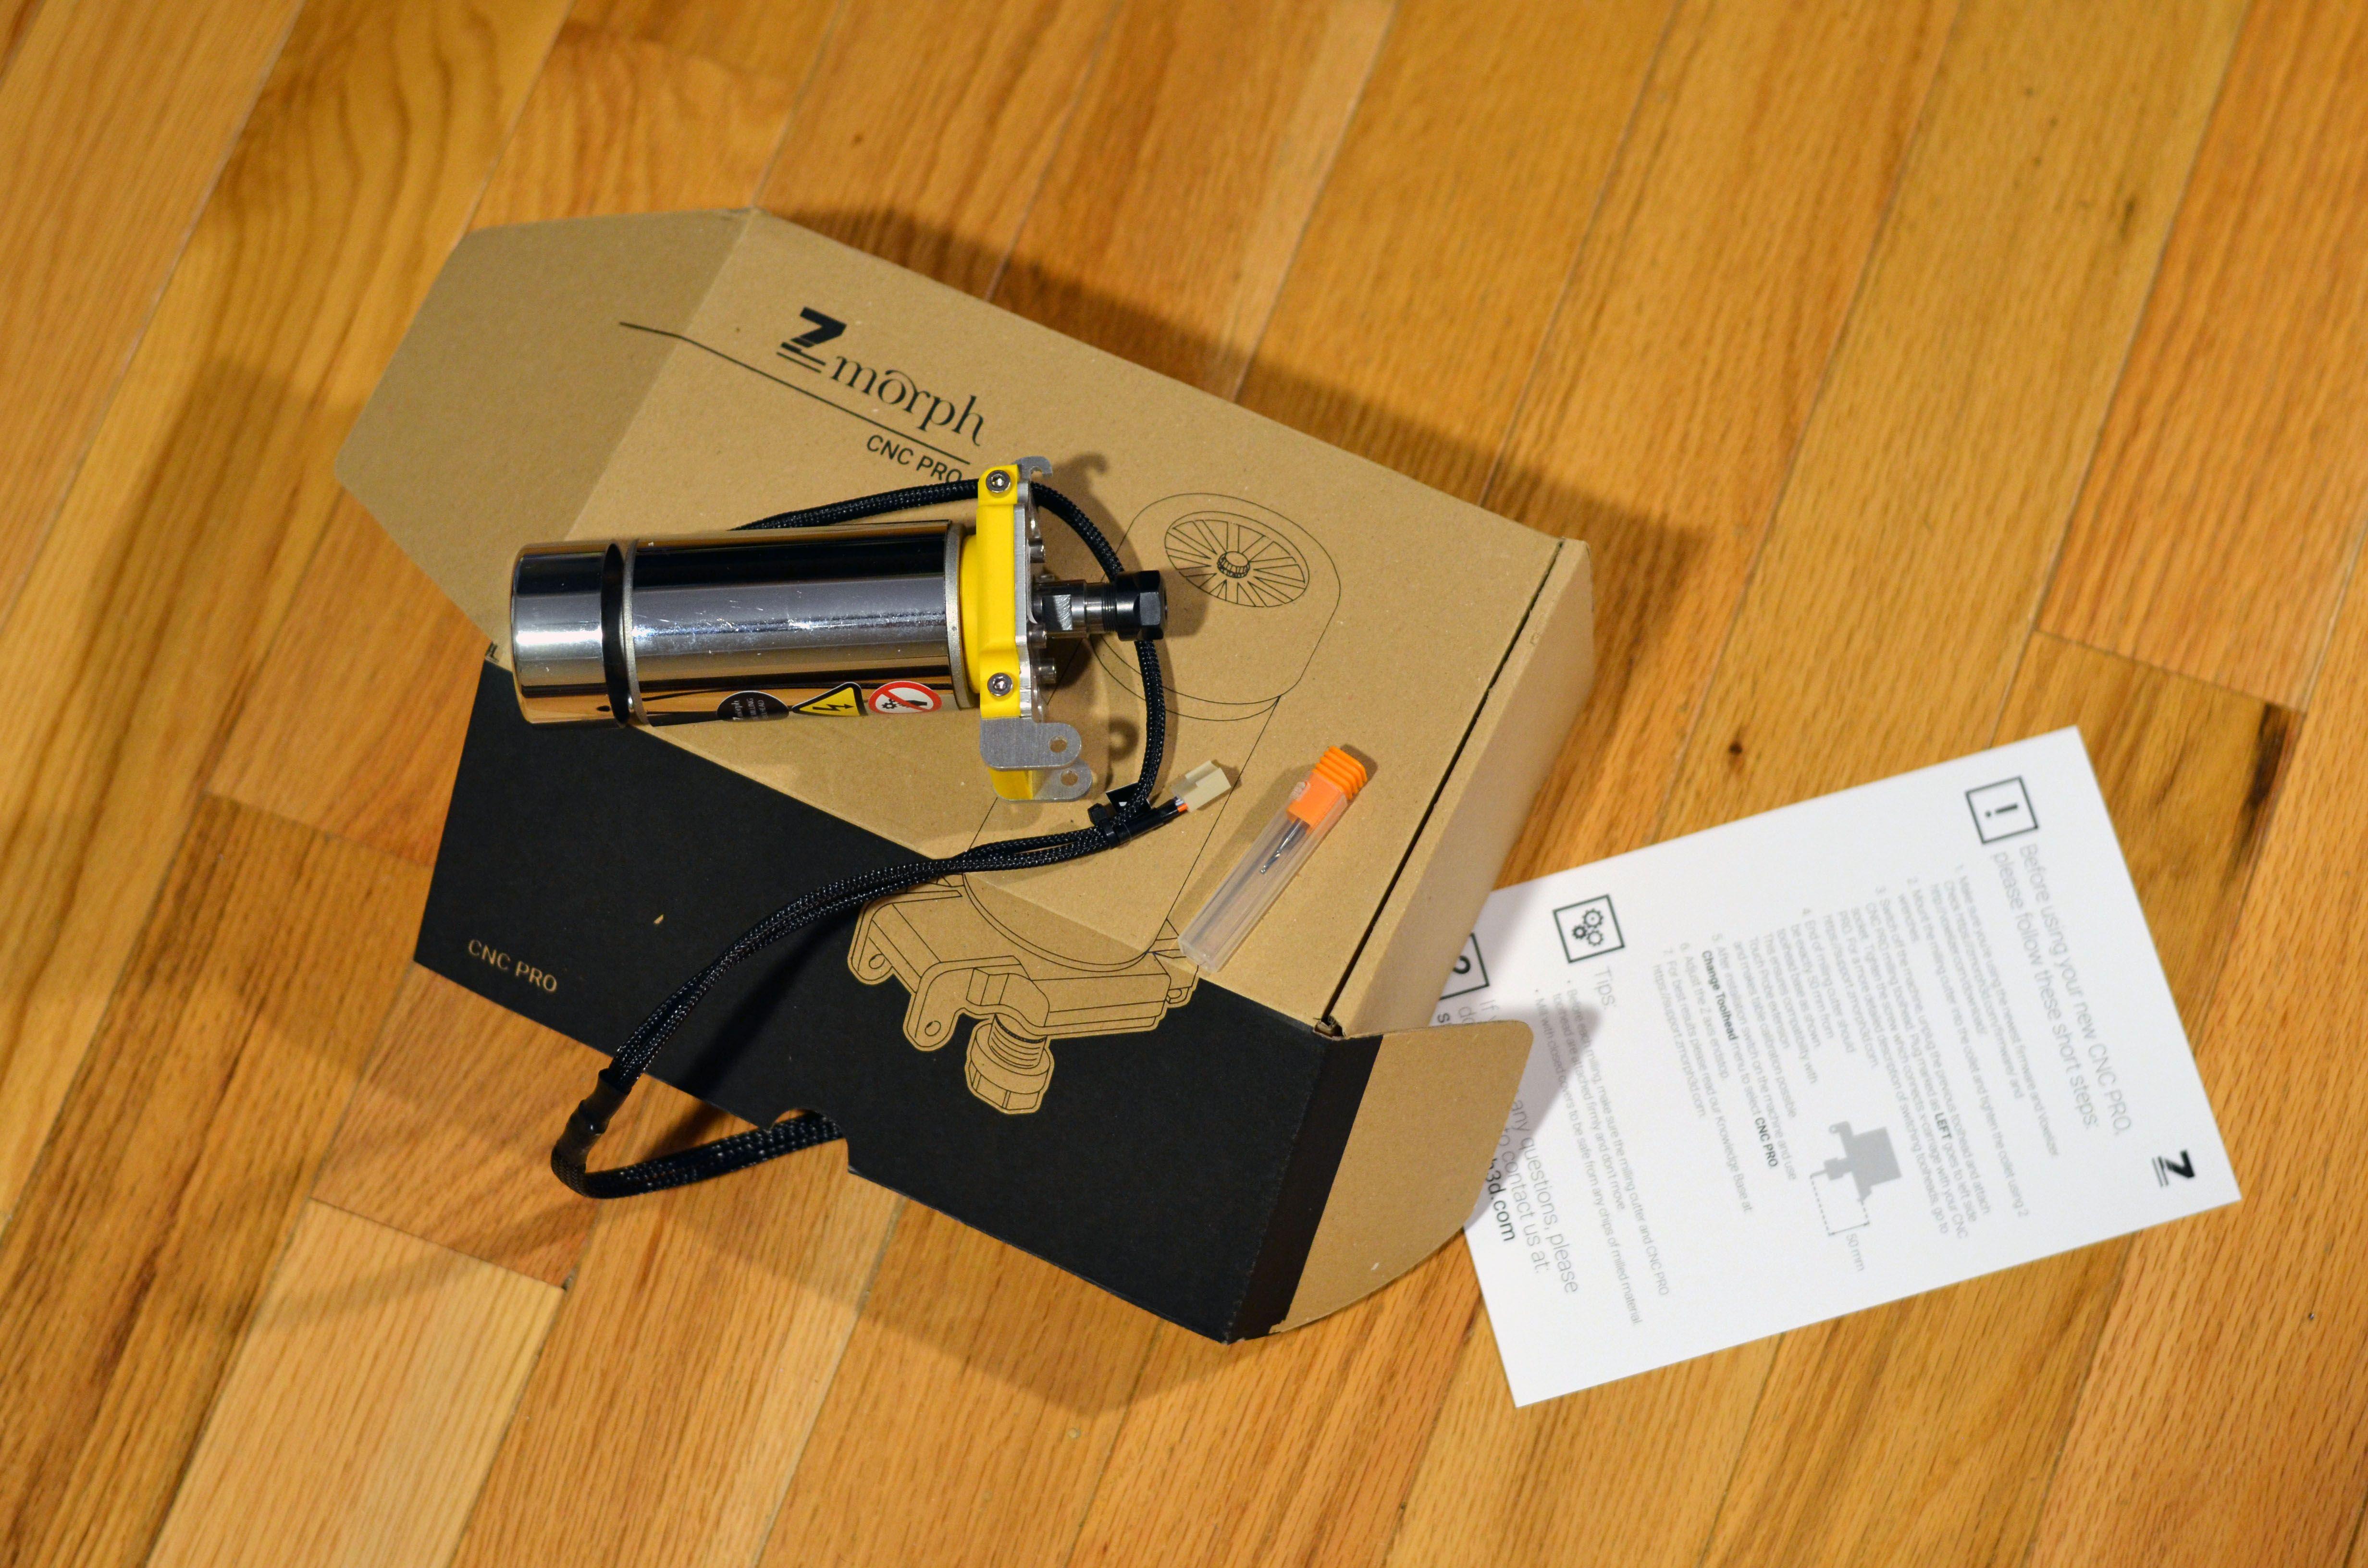 Contents of the CNC Pro toolhead box. It has a carbide bit single flute (2mm).